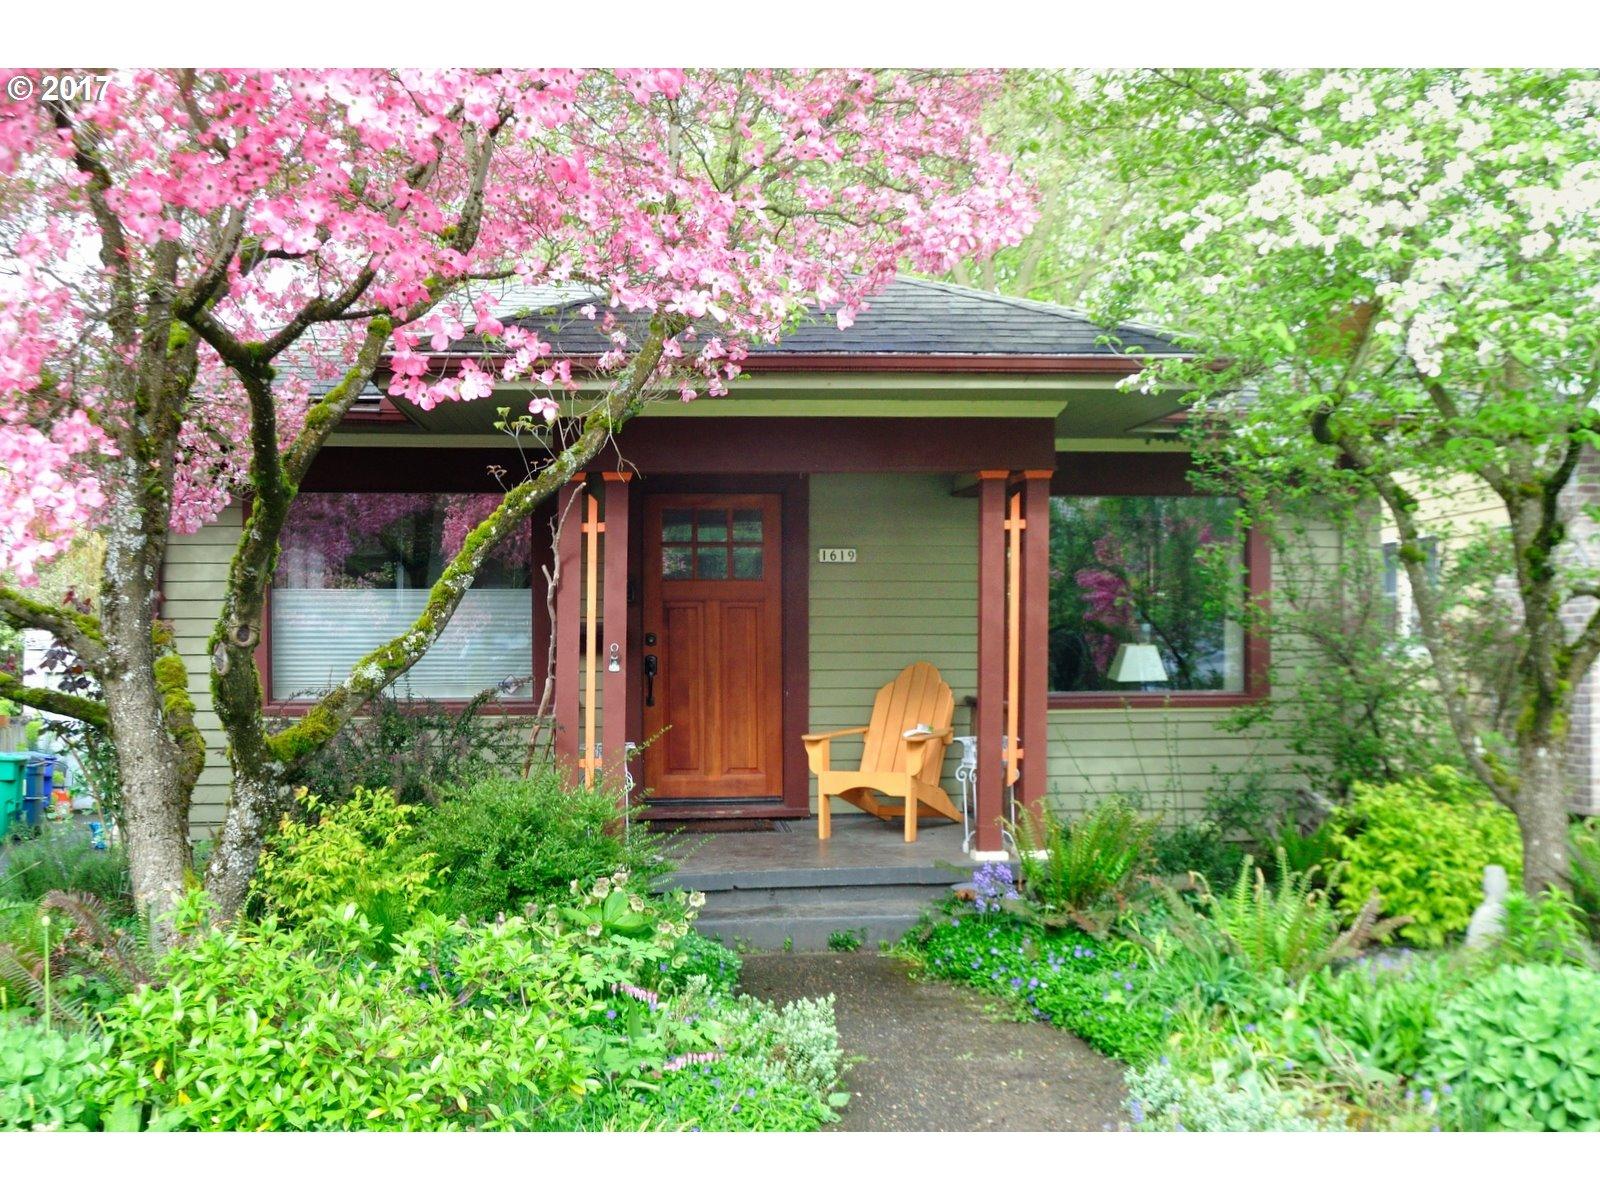 1619 SE 54TH AVE, Portland, OR 97215